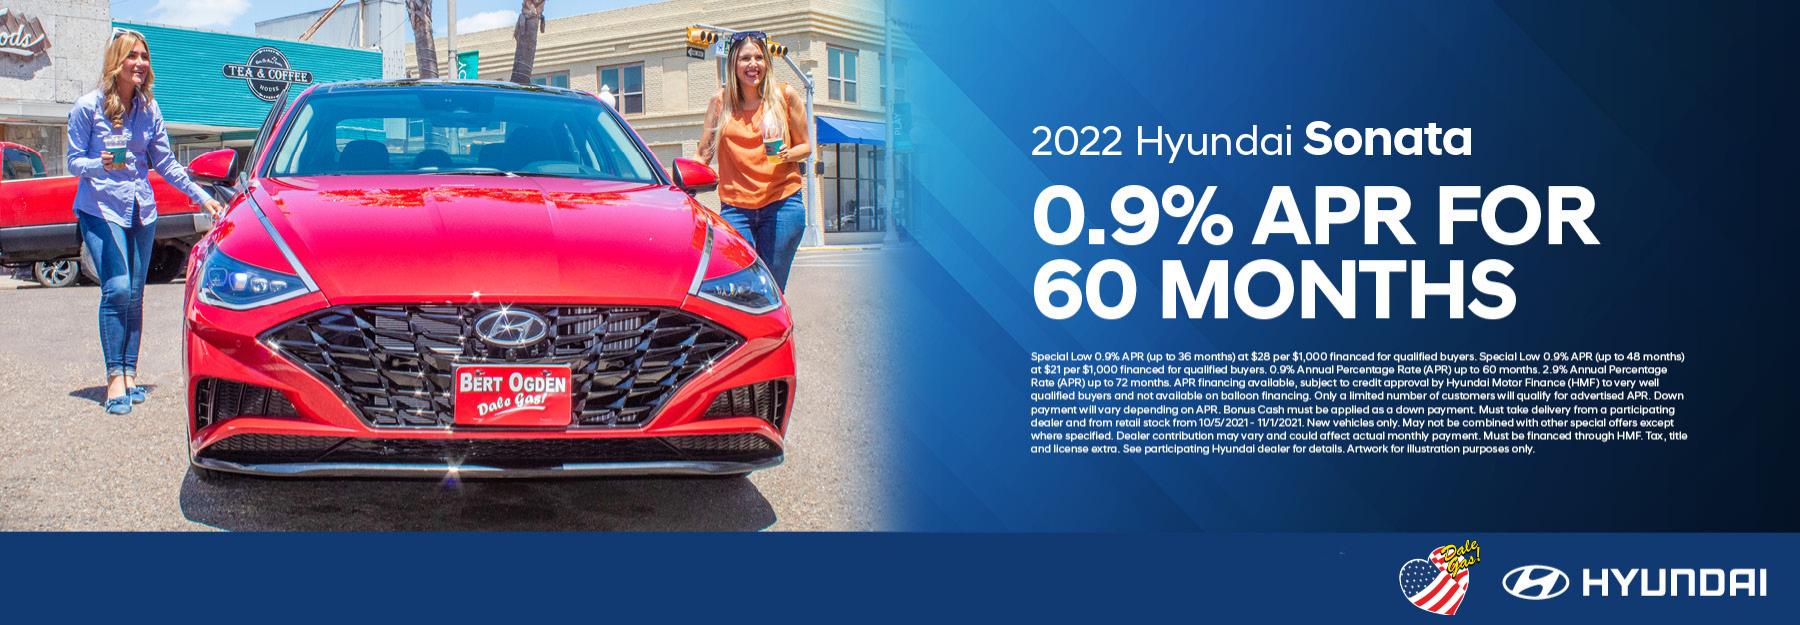 2022 Hyundai Sonata Offer | Bert Ogden Hyundai in Harlingen, Texas